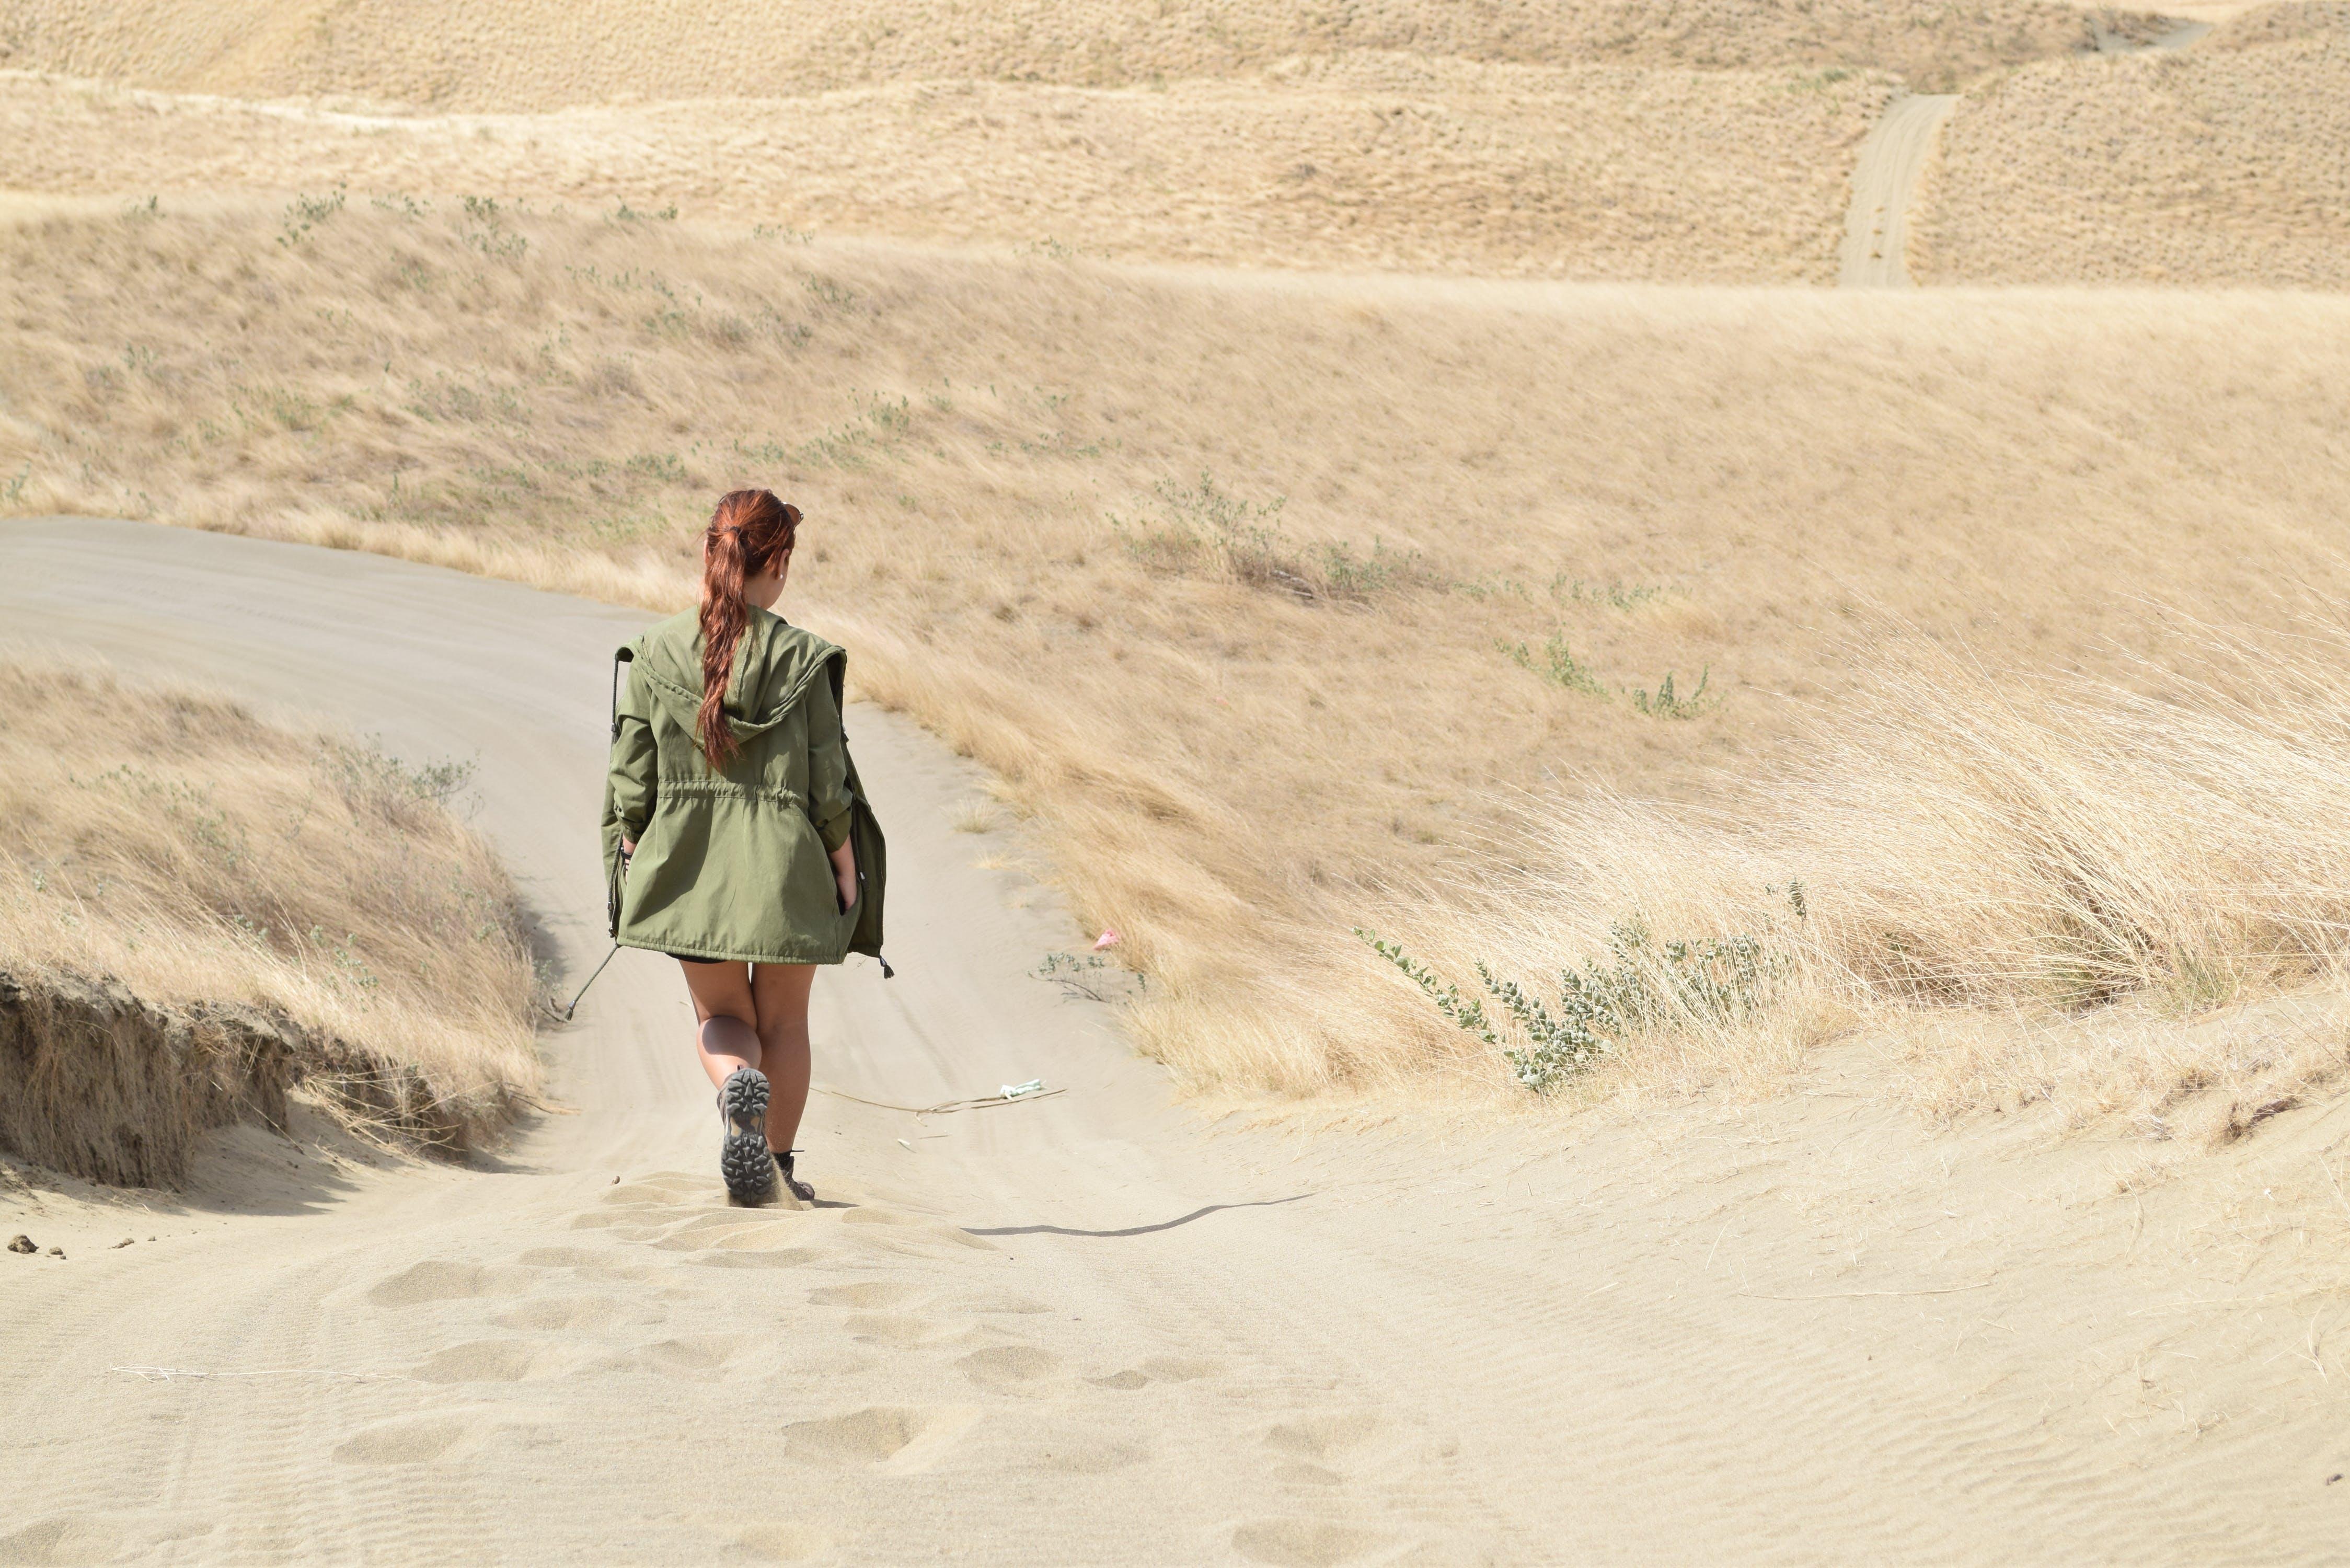 Free stock photo of adventure, desert, excitement, experience